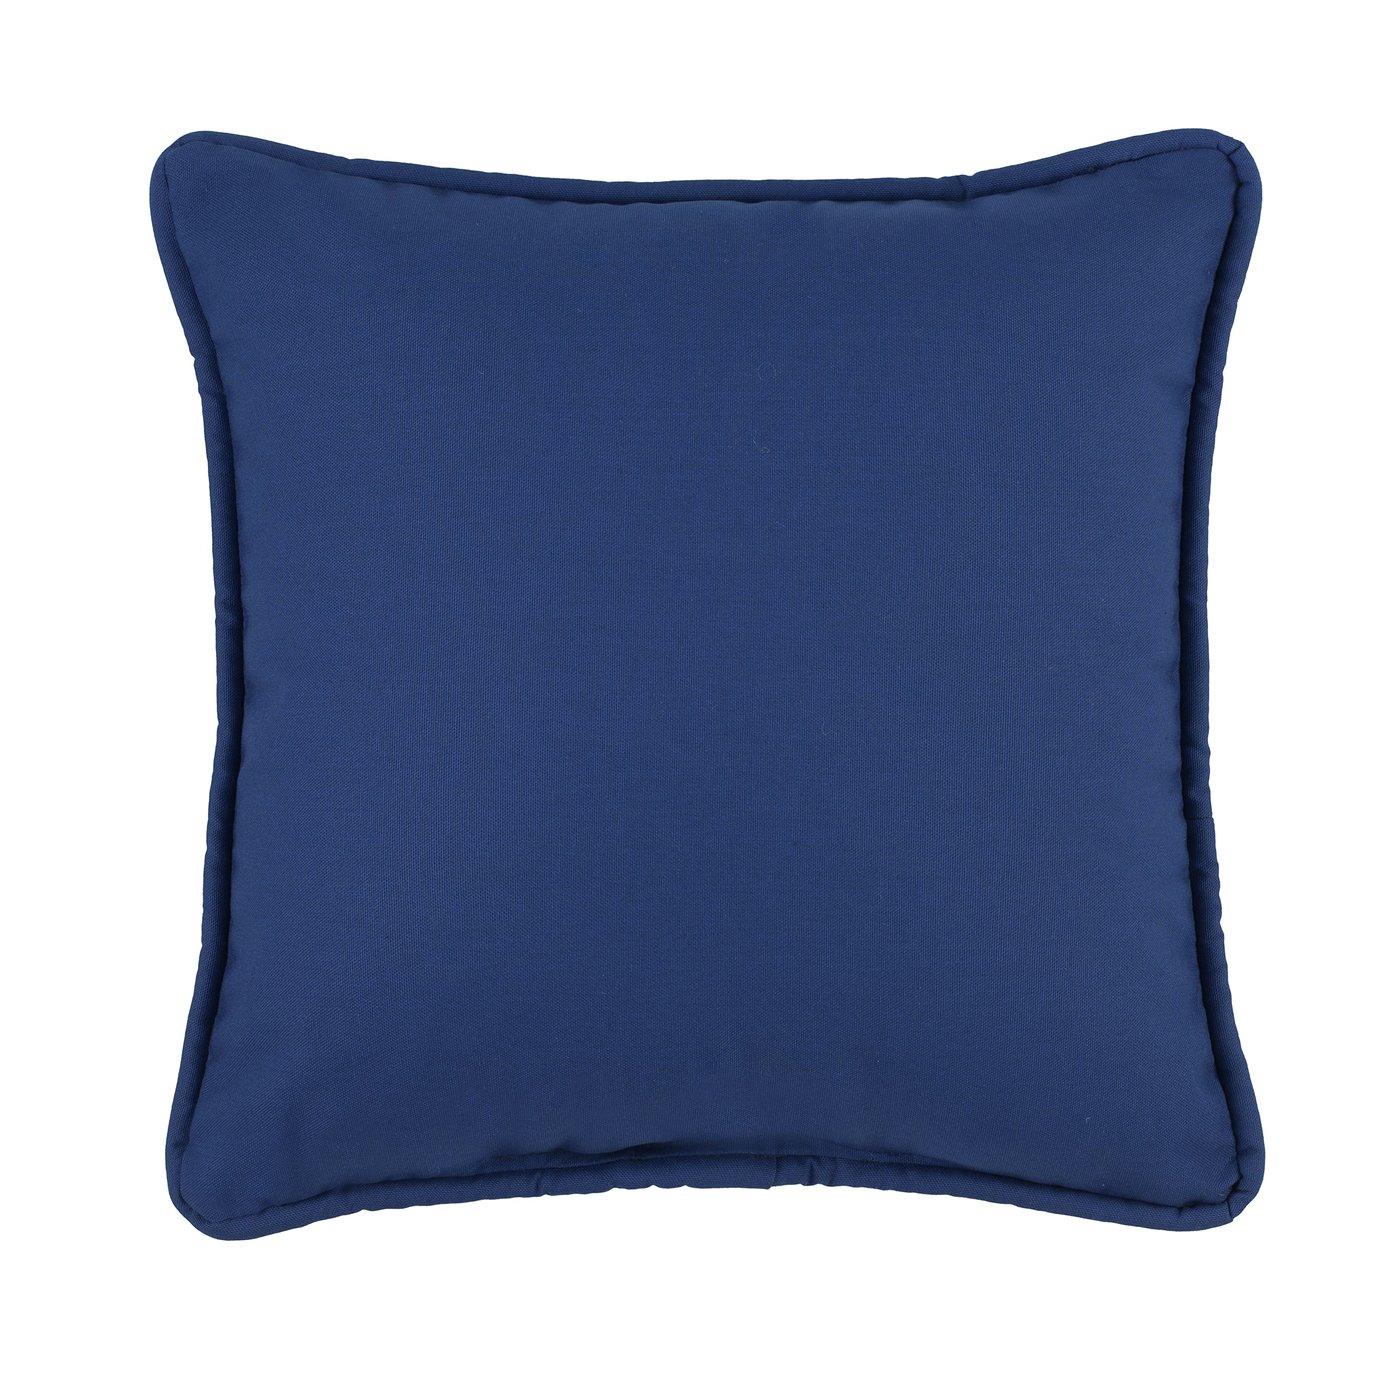 Tropical Paradise Blue Square Pillow - Navy